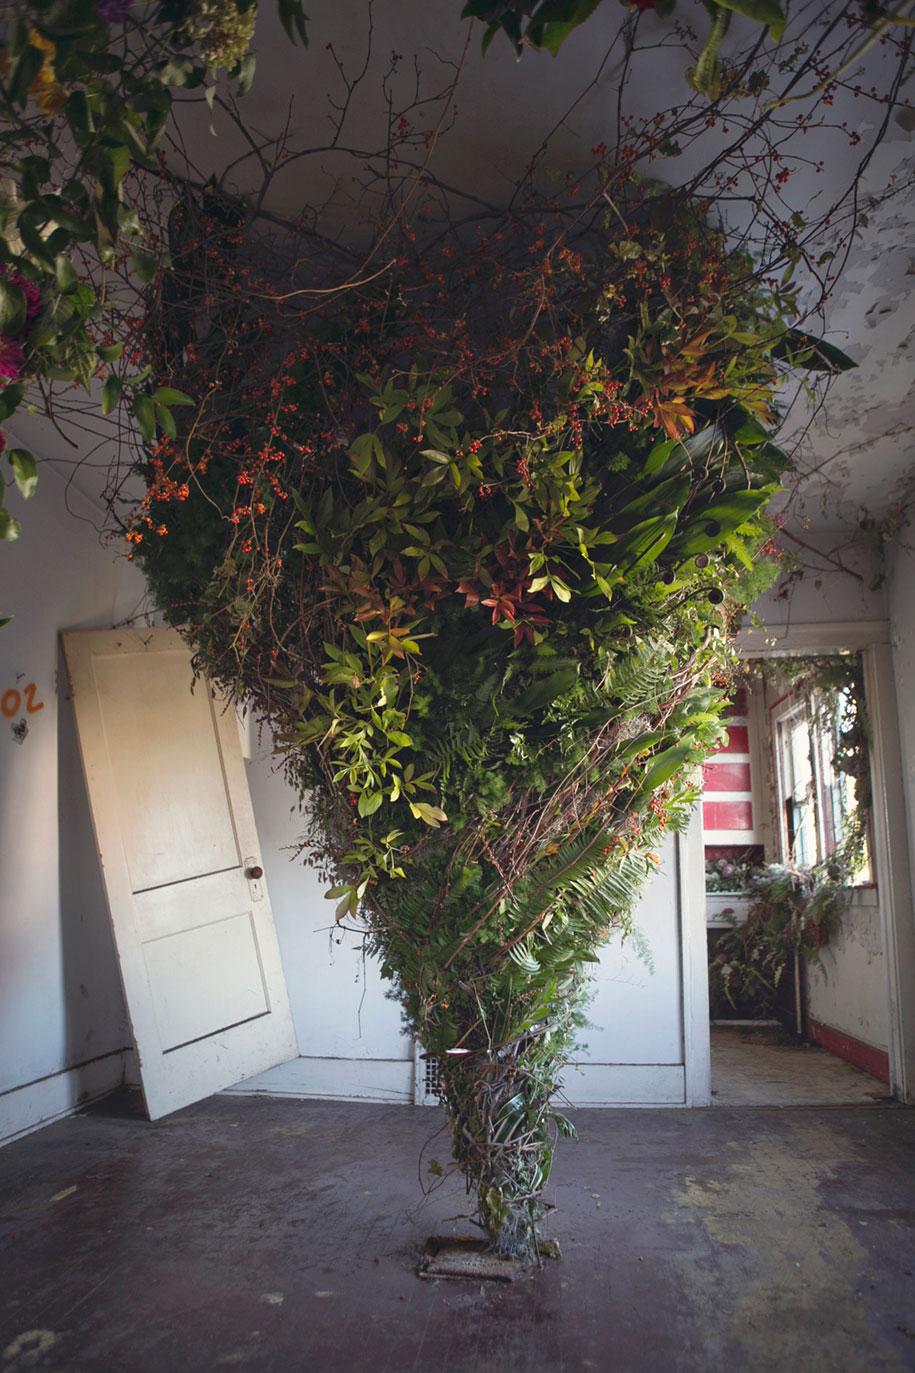 abandoned-house-transformed-flower-house-lisa-waud-heather-saunders-17